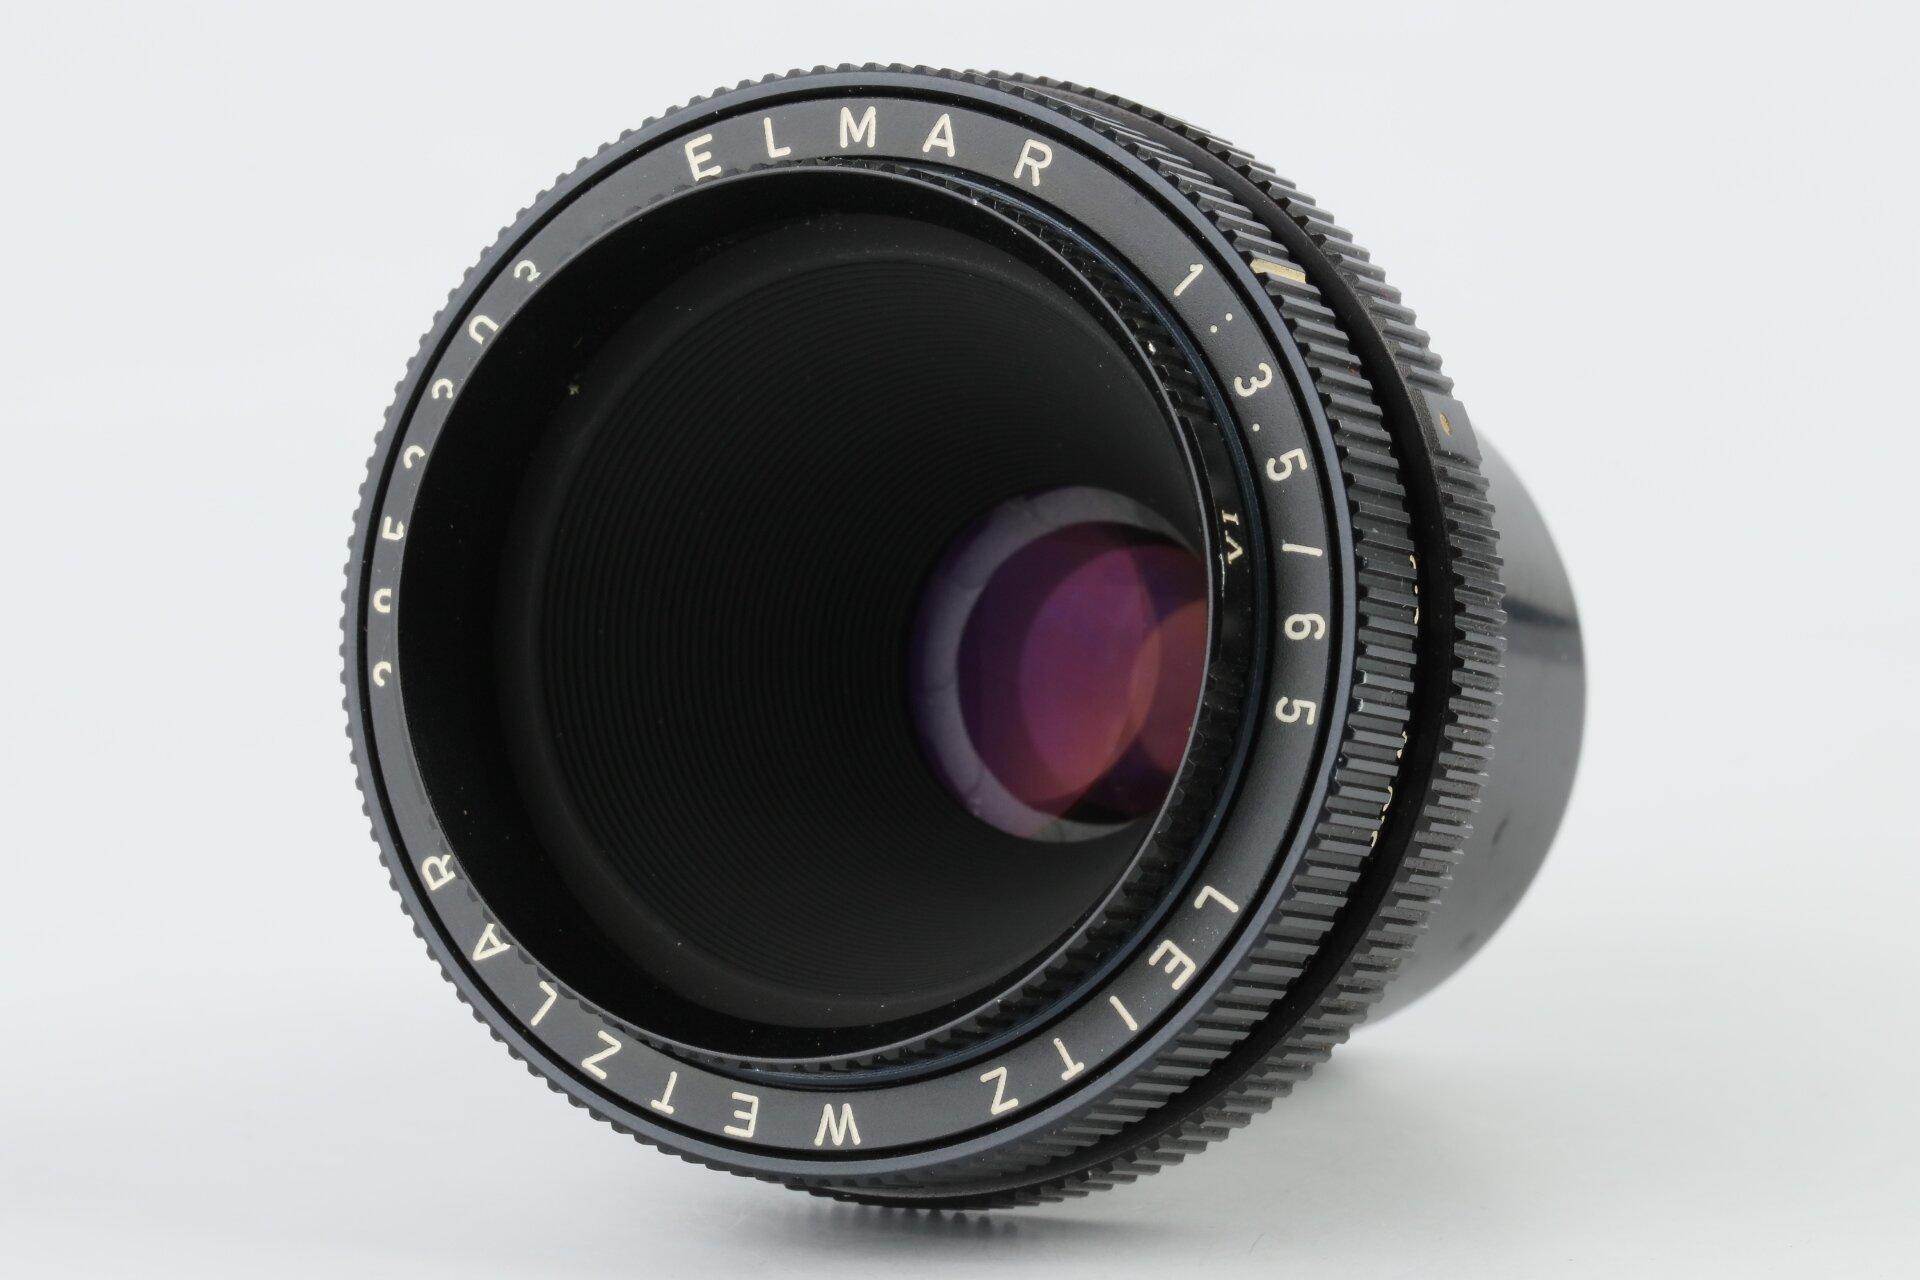 LEITZ Elmar-V 3,5/65mm schwarz 11162 Leica